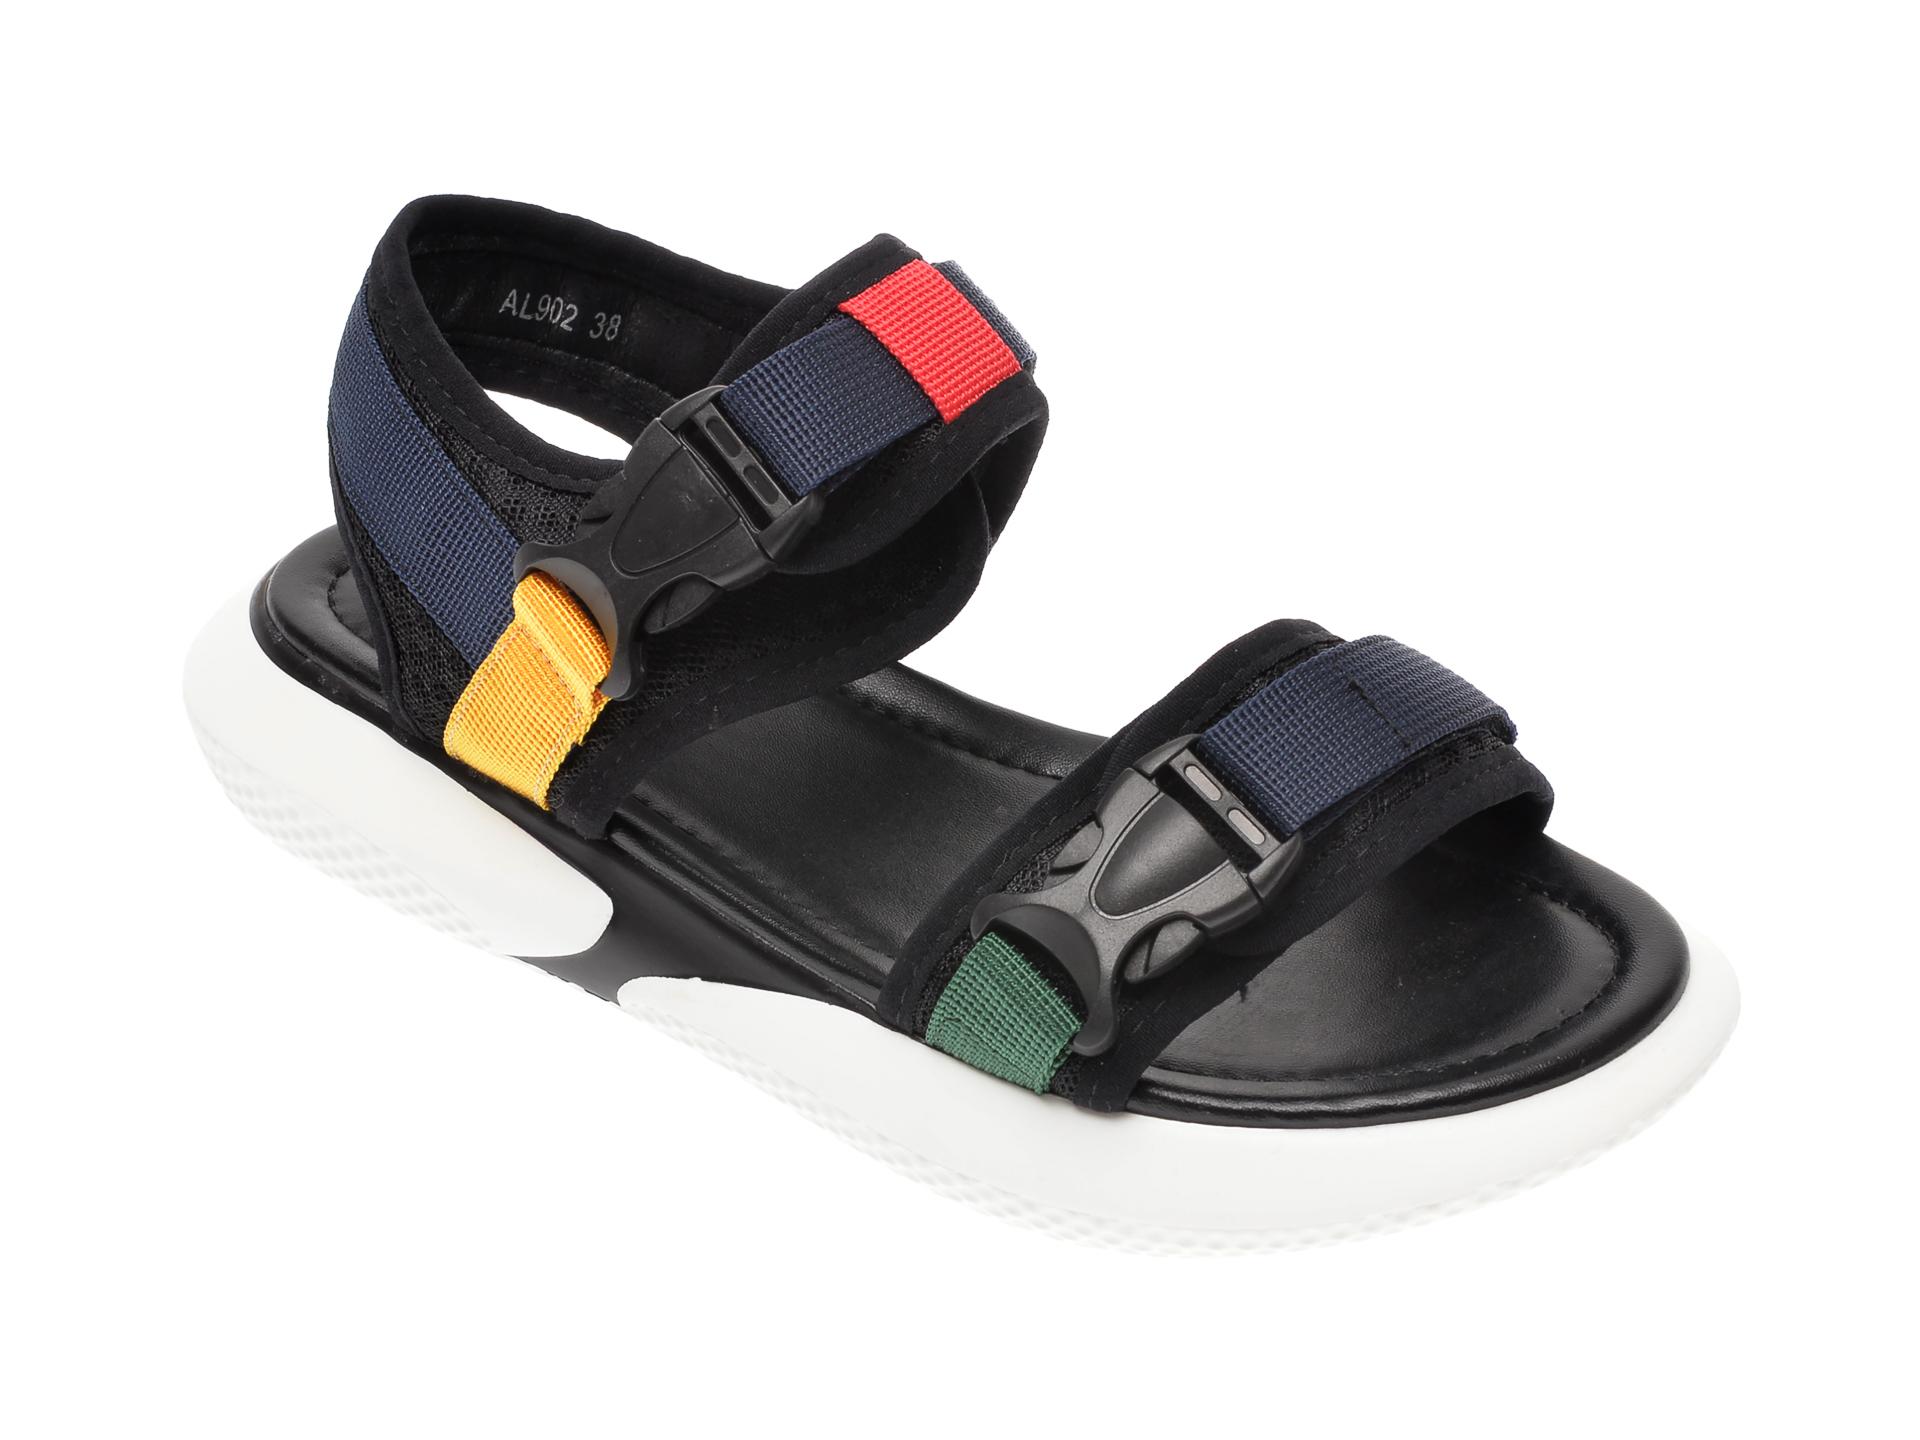 Sandale Image Negre, Al902, Din Material Textil